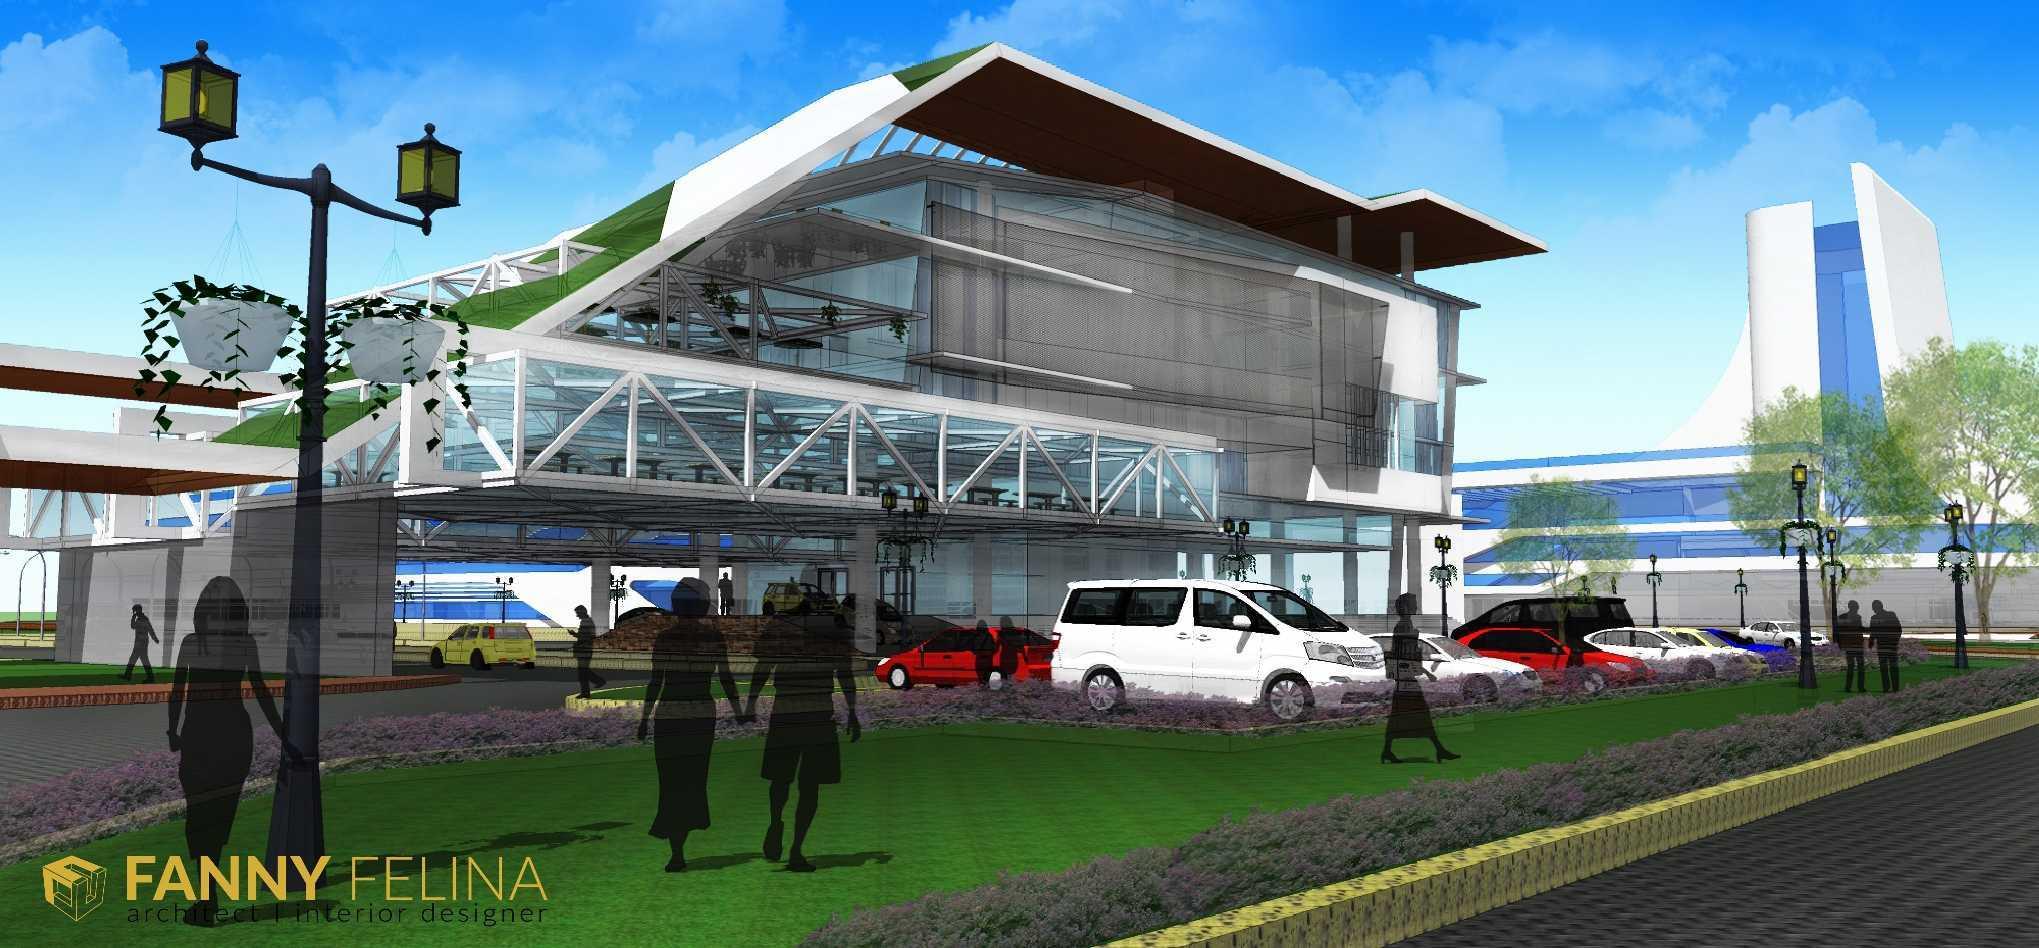 Fanny Felina Architecture & Interior Design Oasystem Office Surabaya, Surabaya City, East Java, Indonesia Surabaya, Surabaya City, East Java, Indonesia 05 Kontemporer,modern  35327